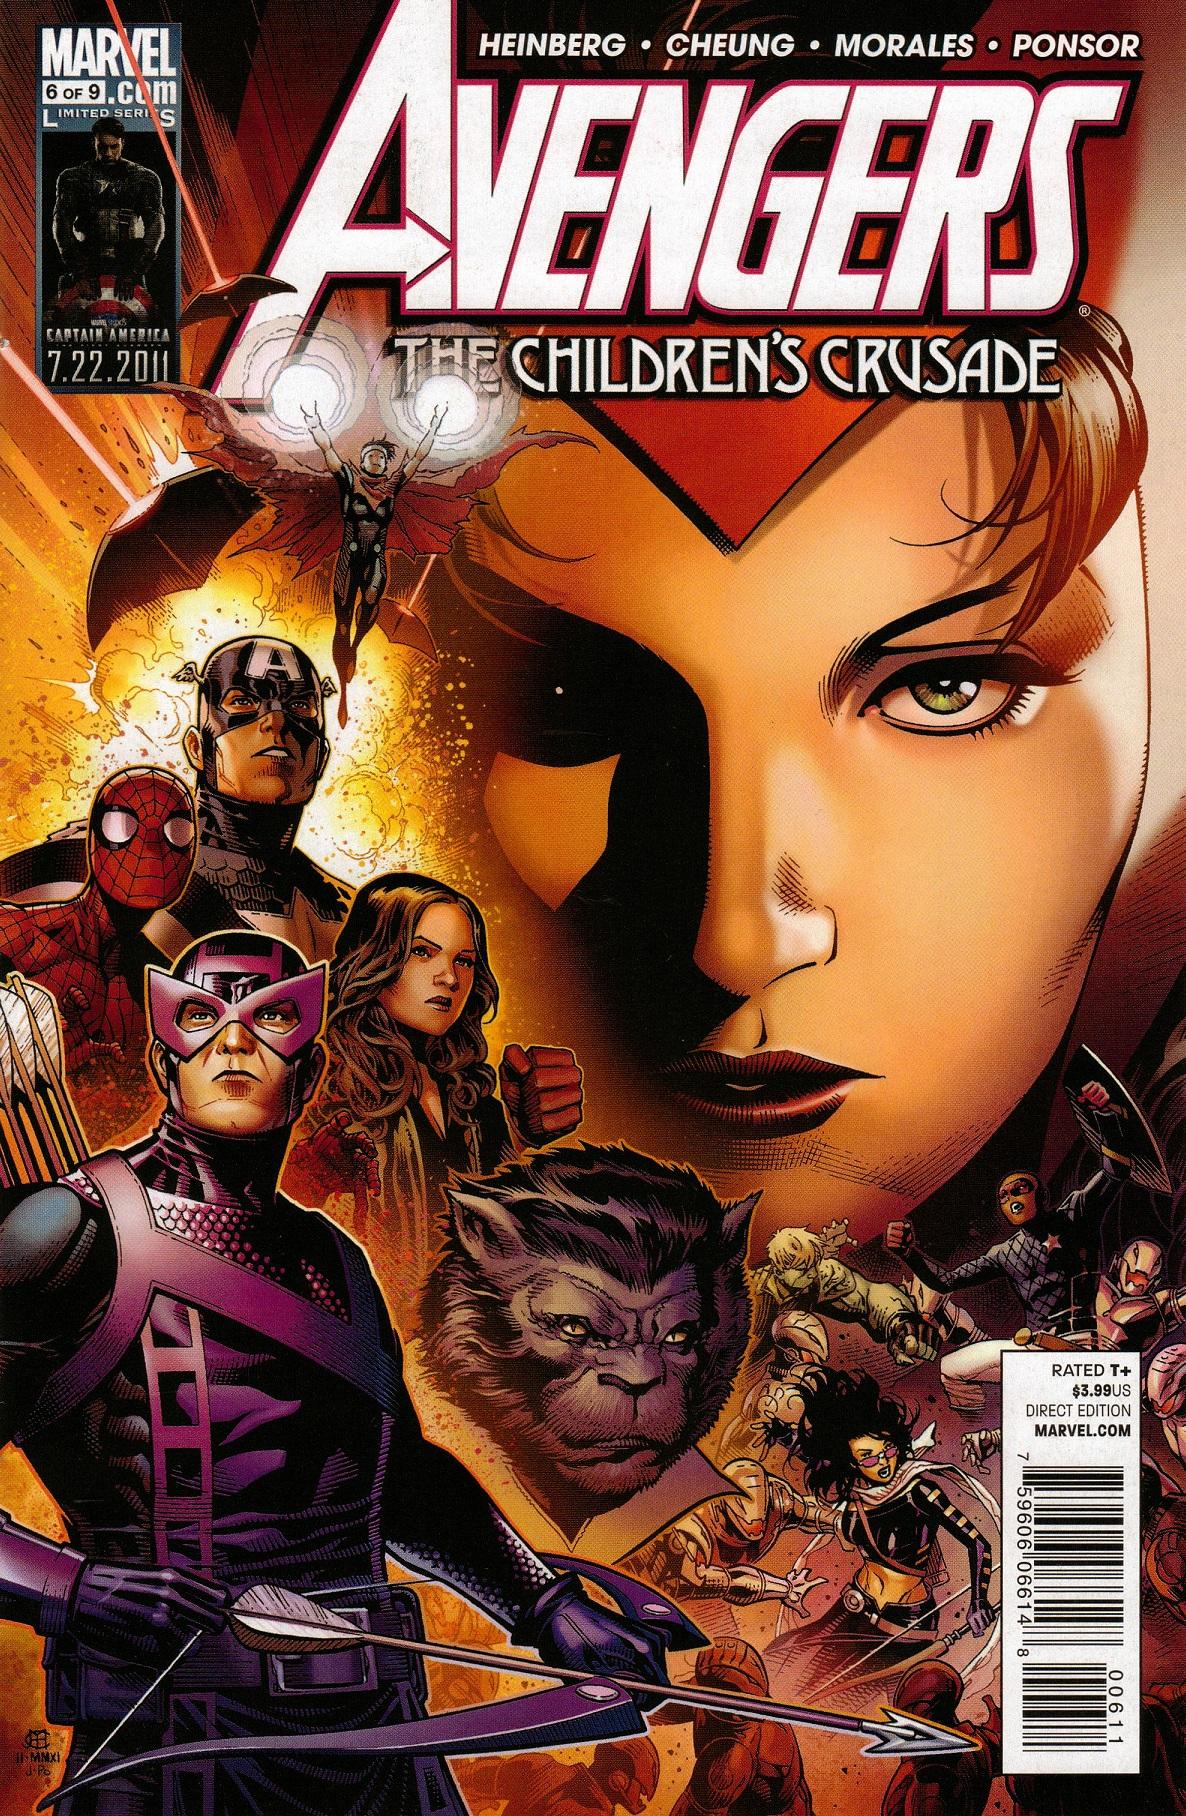 Avengers: The Children's Crusade Vol 1 6